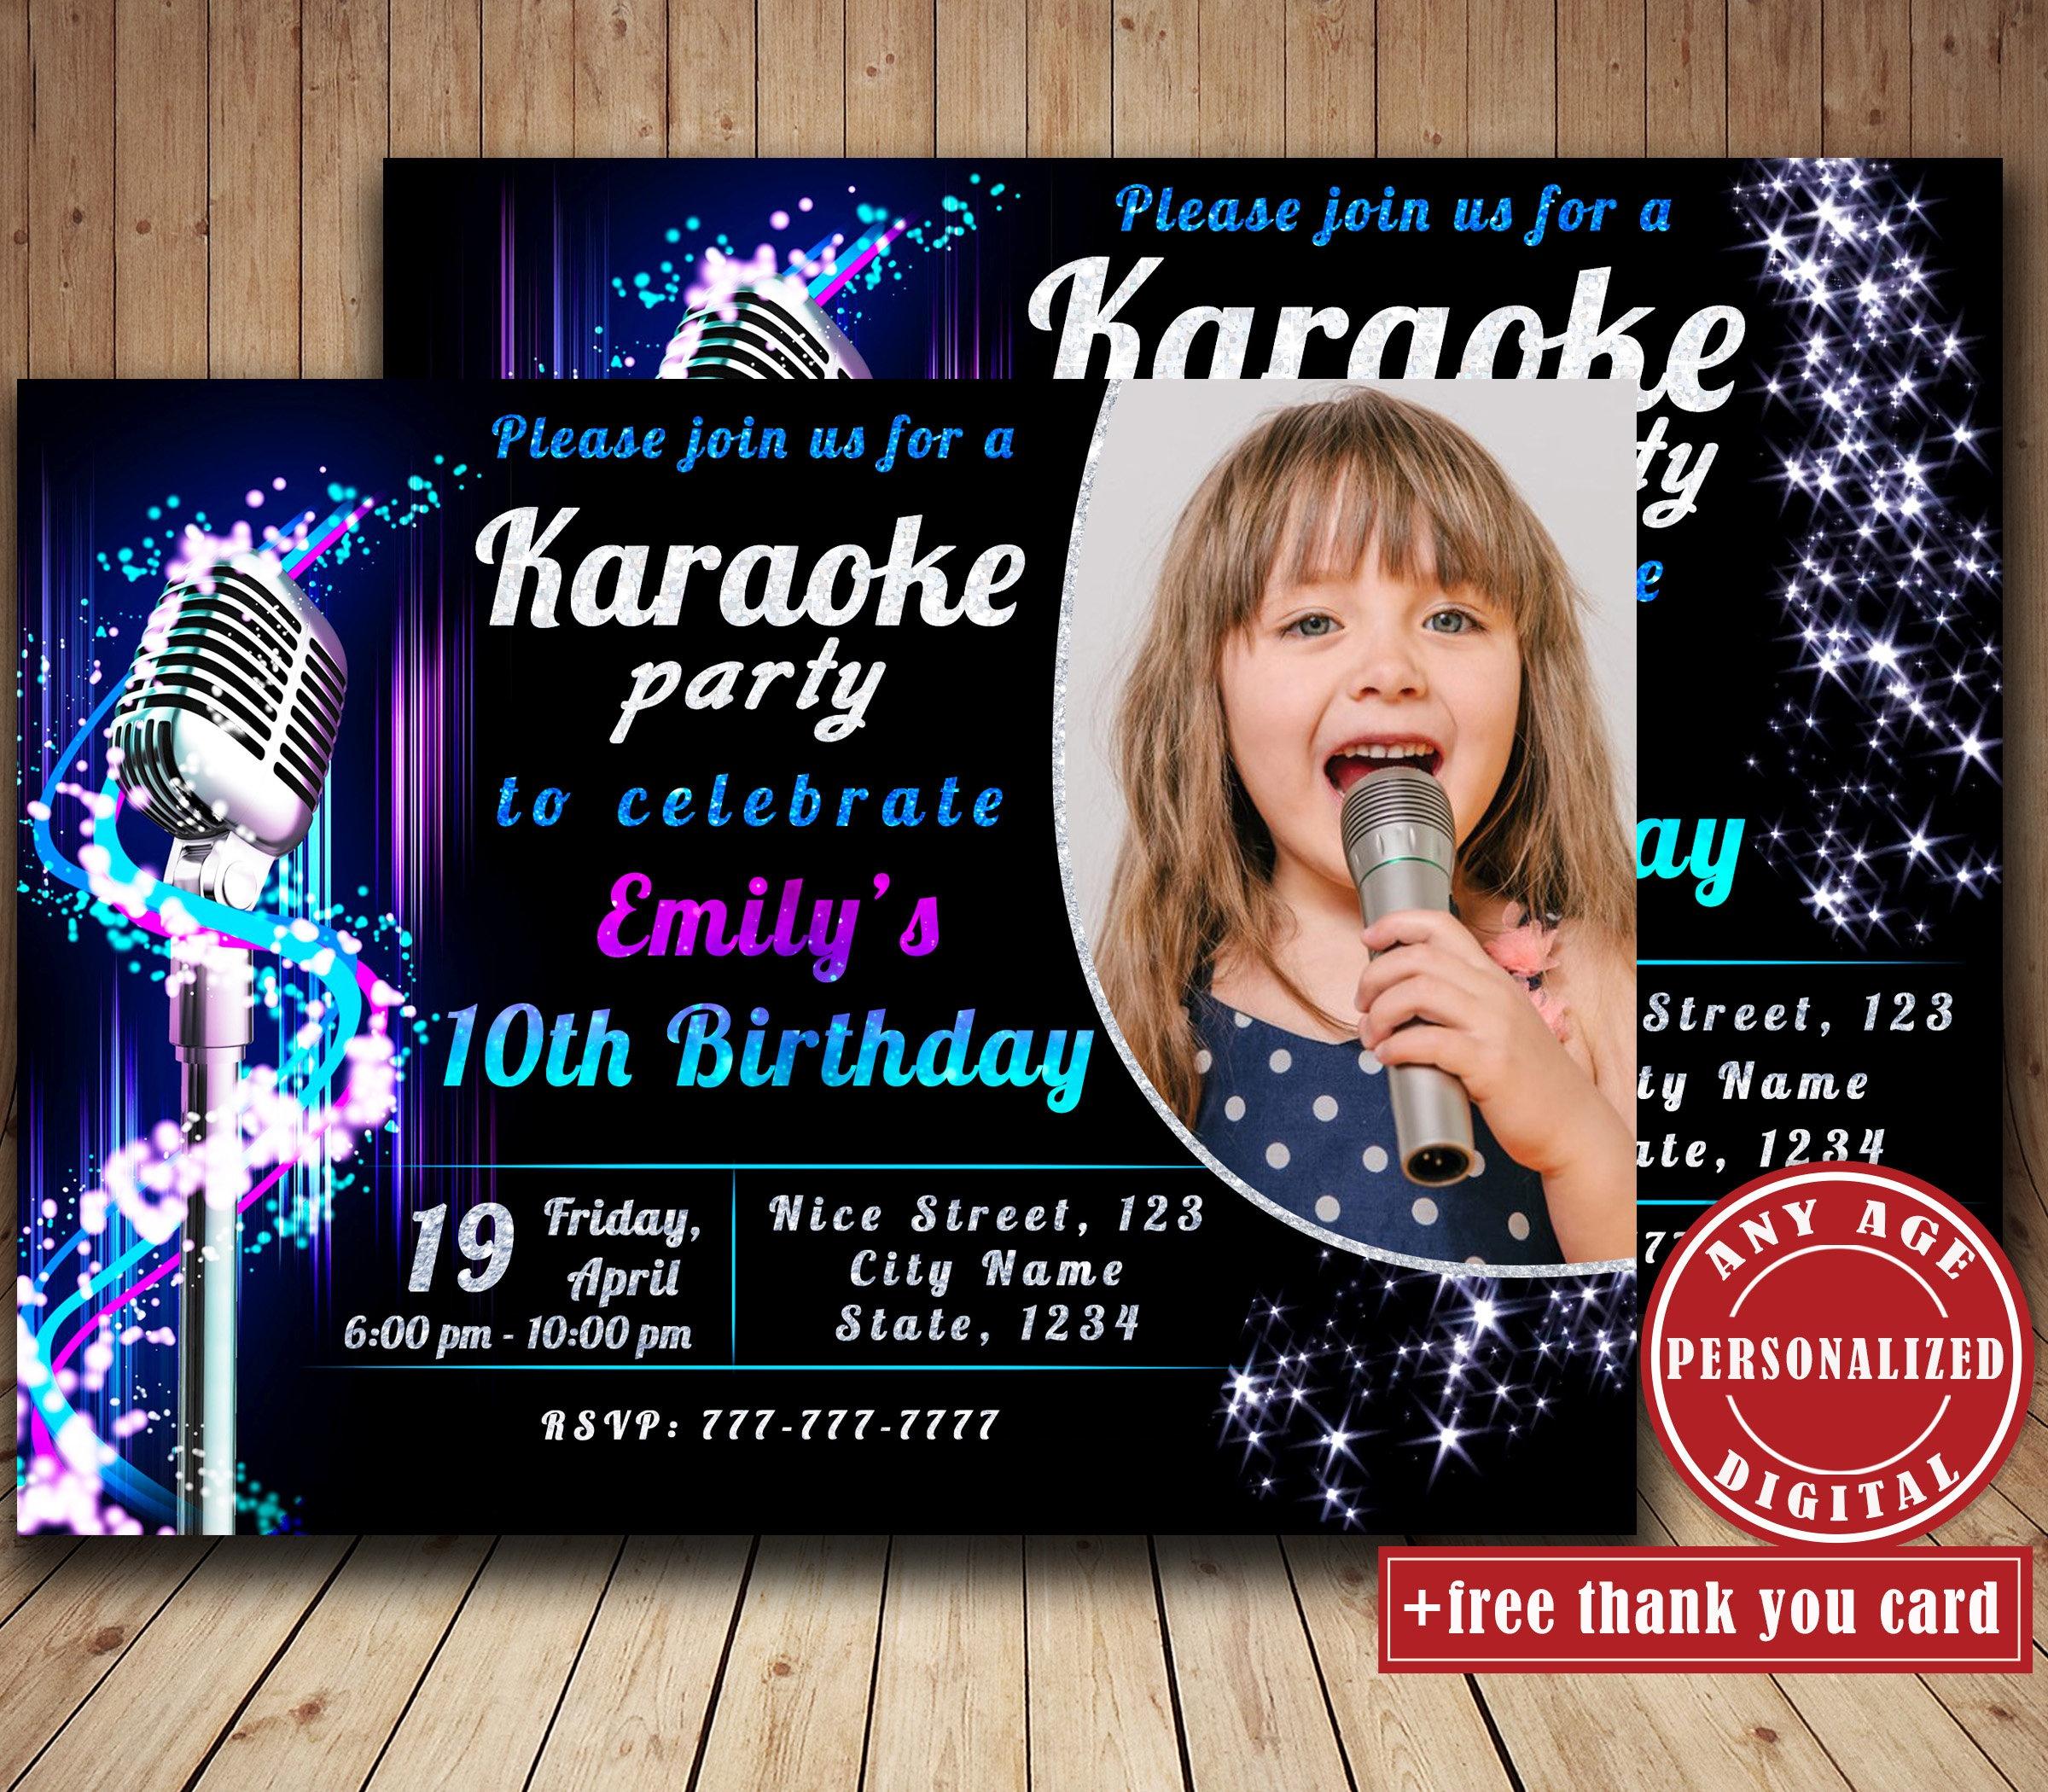 Karaoke Birthday Party Invitation With Photo Singing Party   Etsy - Free Printable Karaoke Party Invitations